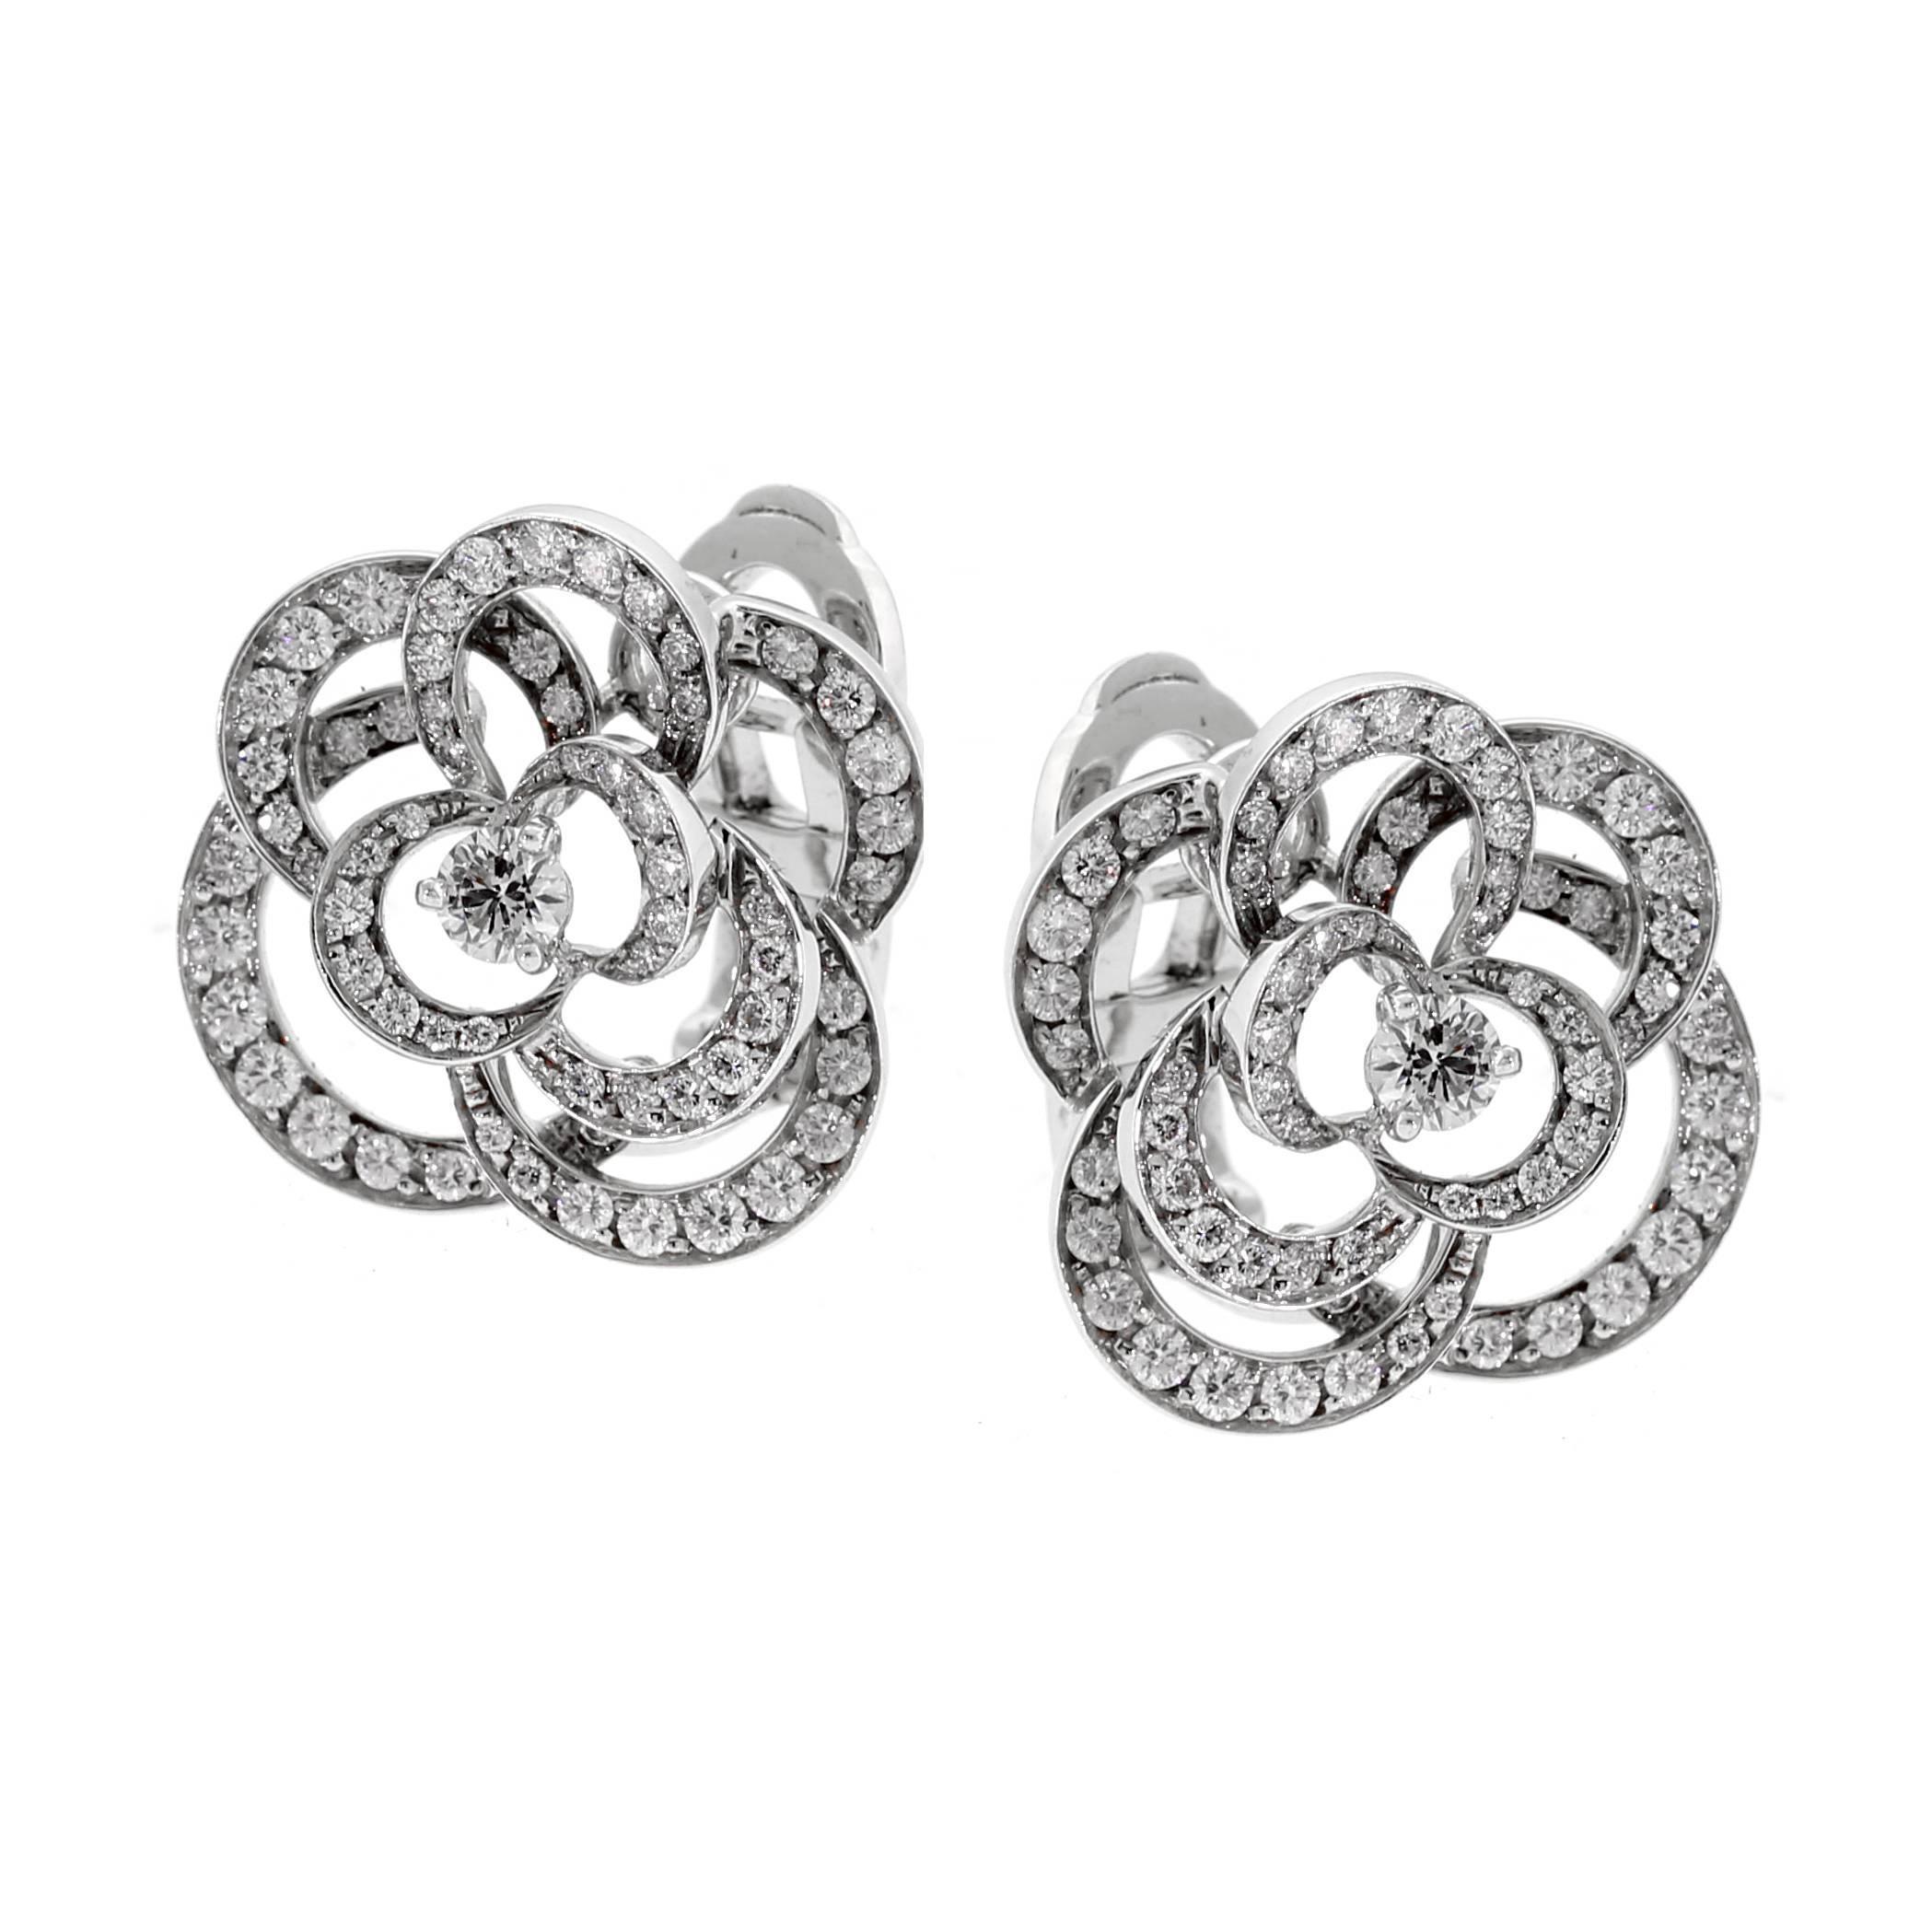 1f50c5e49 Chanel Camellia Diamond Earrings at 1stdibs